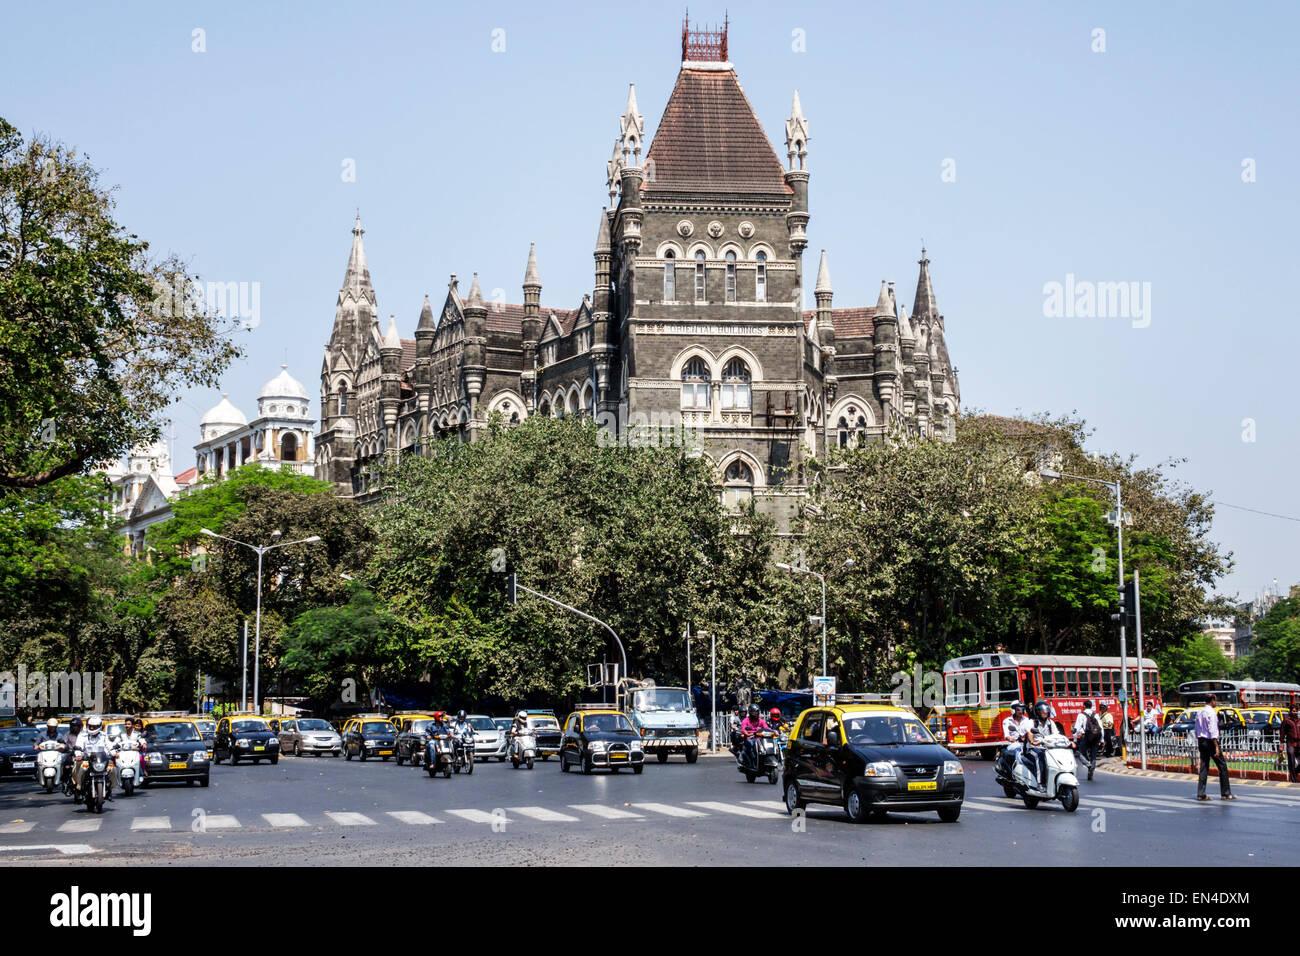 Asia India Mumbai Mumbai Fort calle Mahatma Gandhi edificios orientales tráfico automóviles automóviles Imagen De Stock